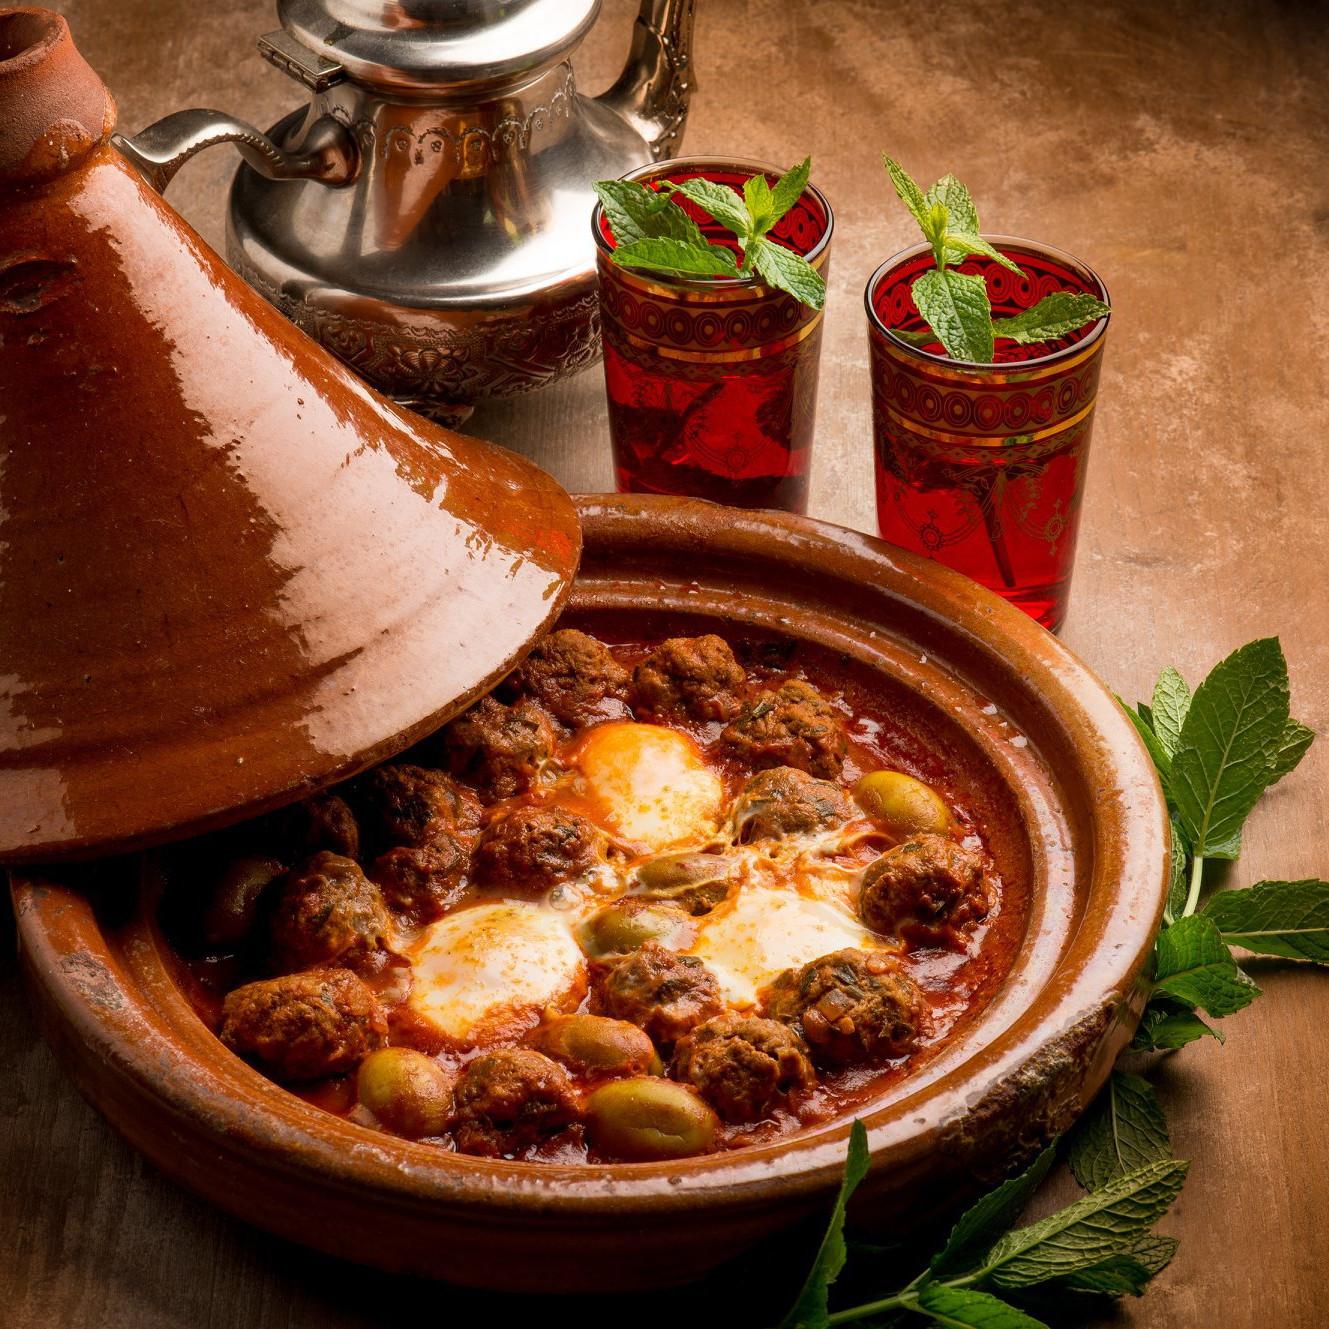 Tajine Moroccan food